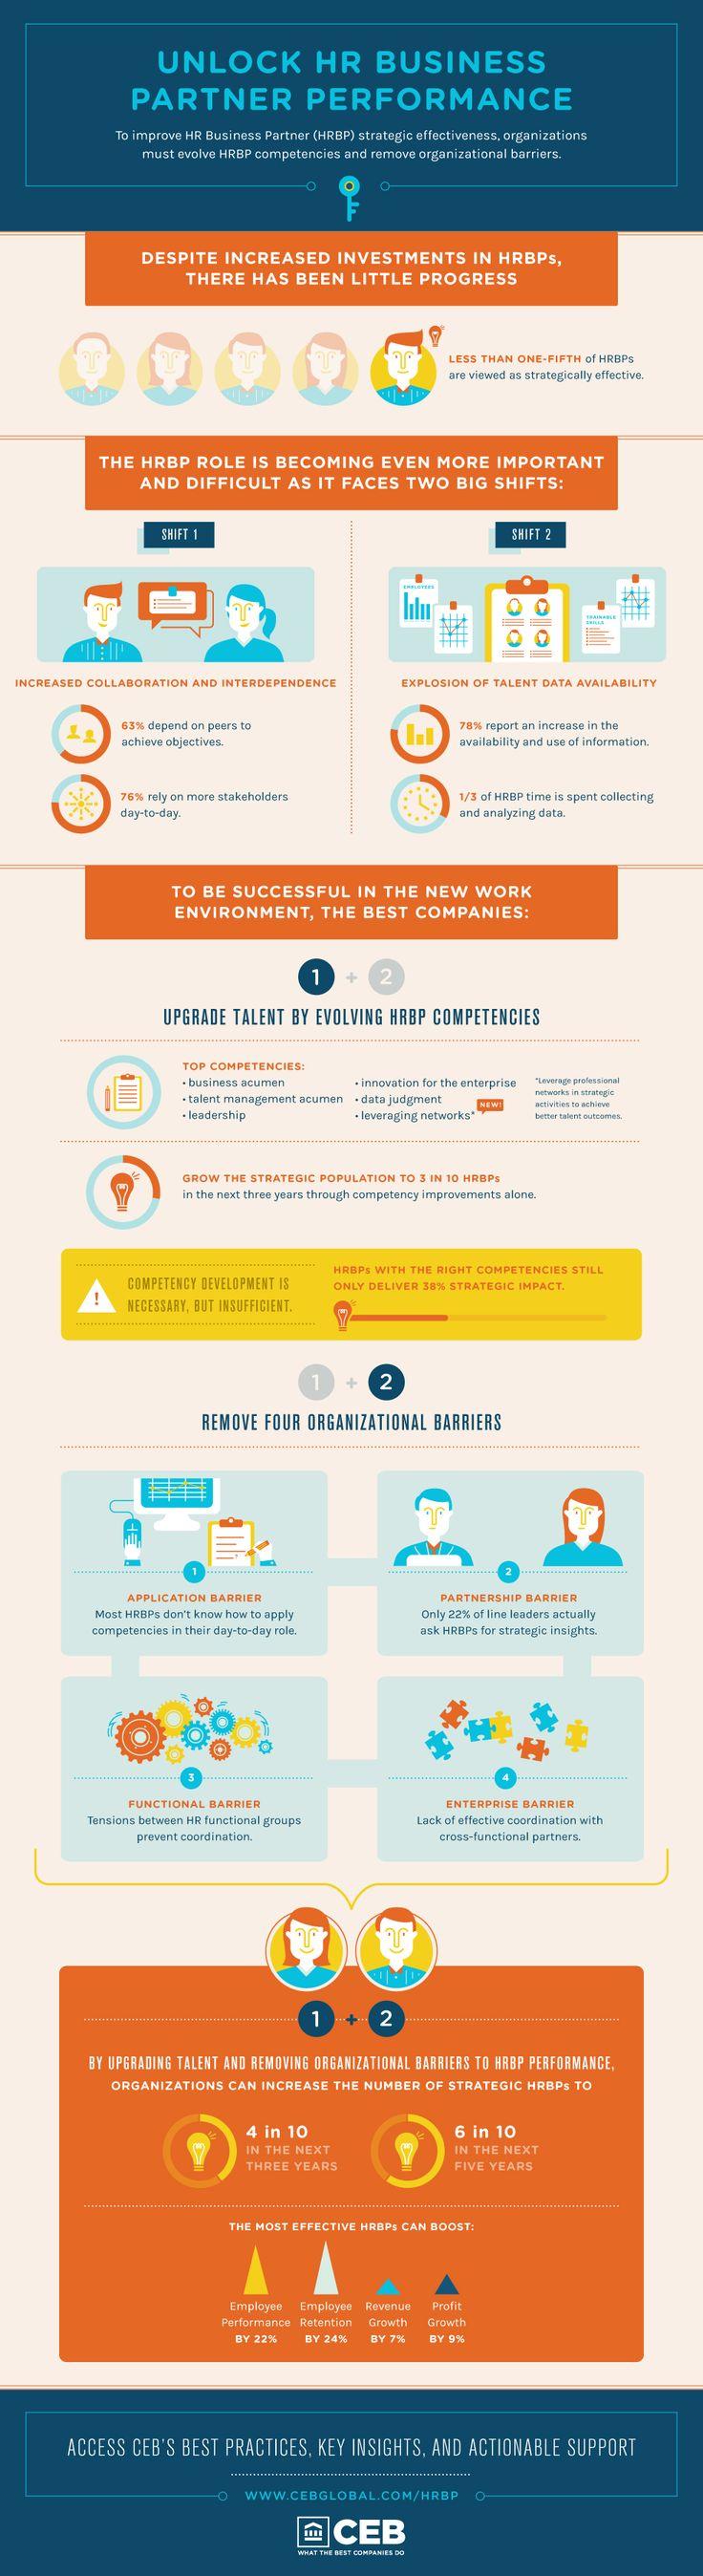 63 best images about HR Metrics on Pinterest